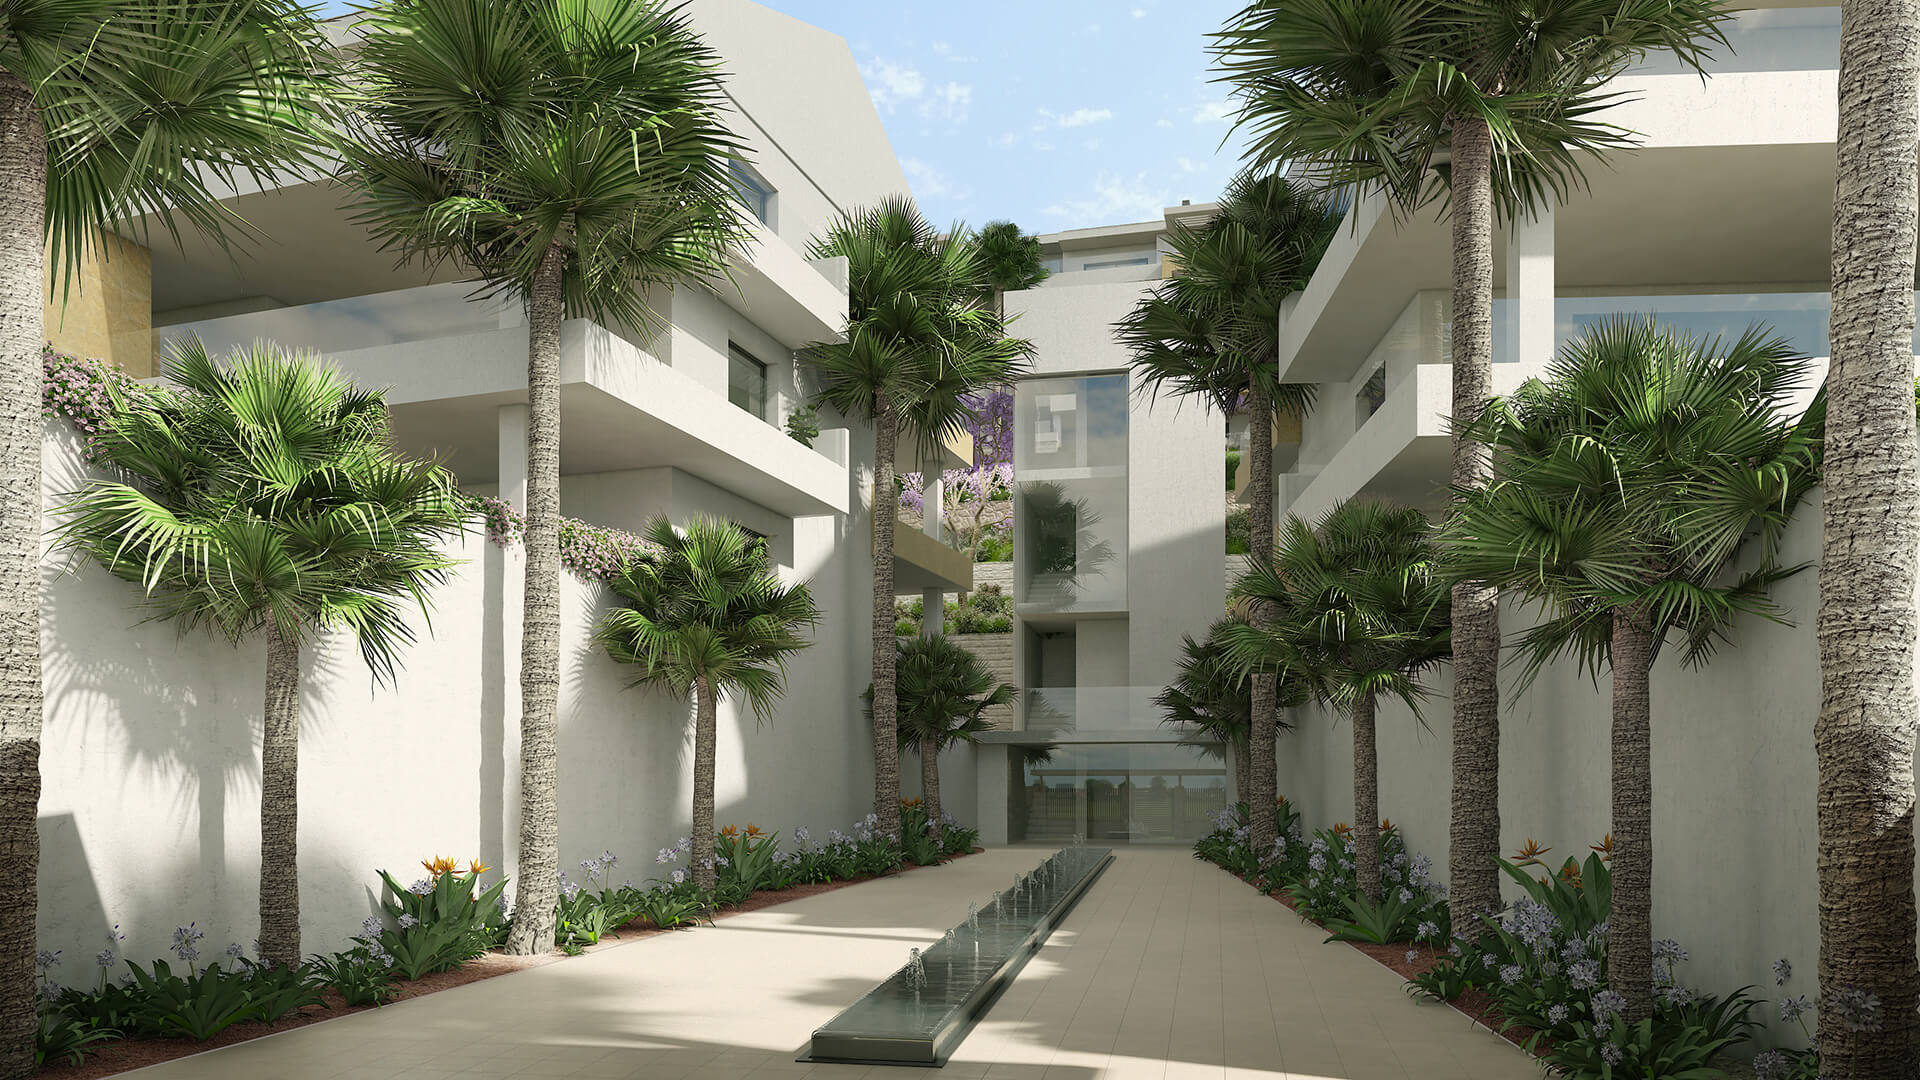 Apartment in Benalmadena MA2580293 2